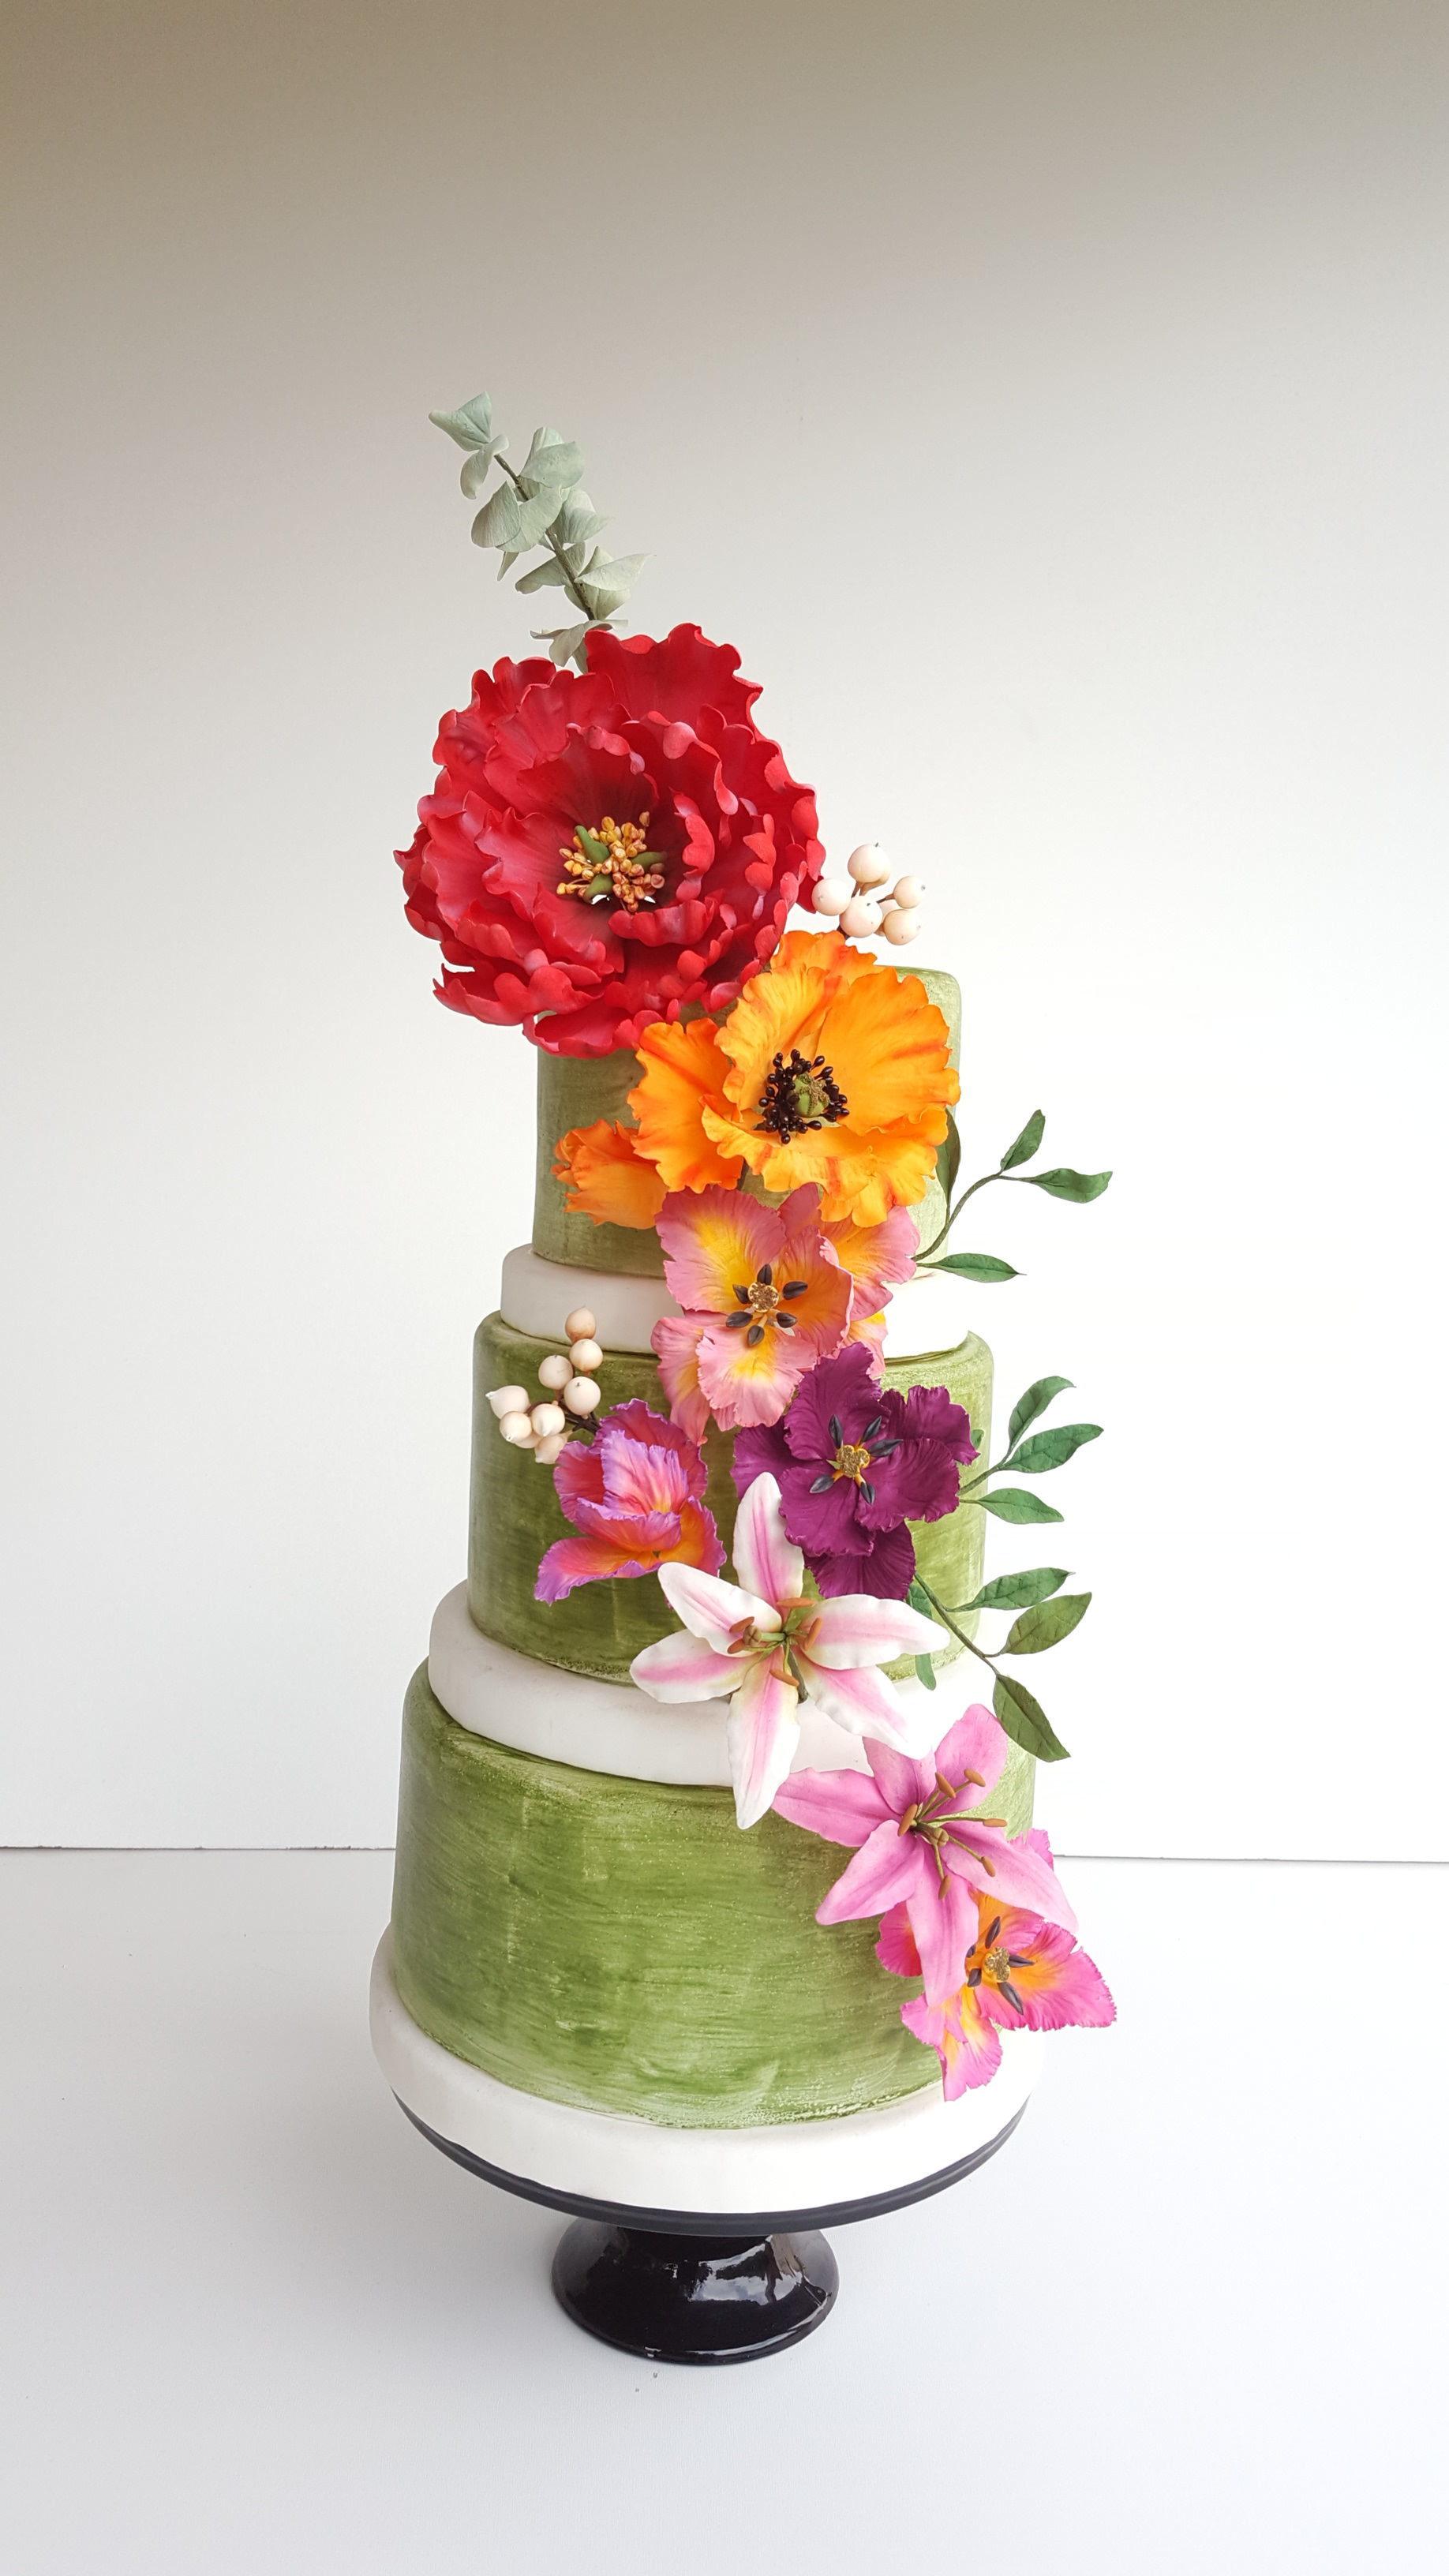 Andrea-Gorigoitia-Areal-Pastry-Geek-Wedding-Elegant-4.jpg#asset:13104